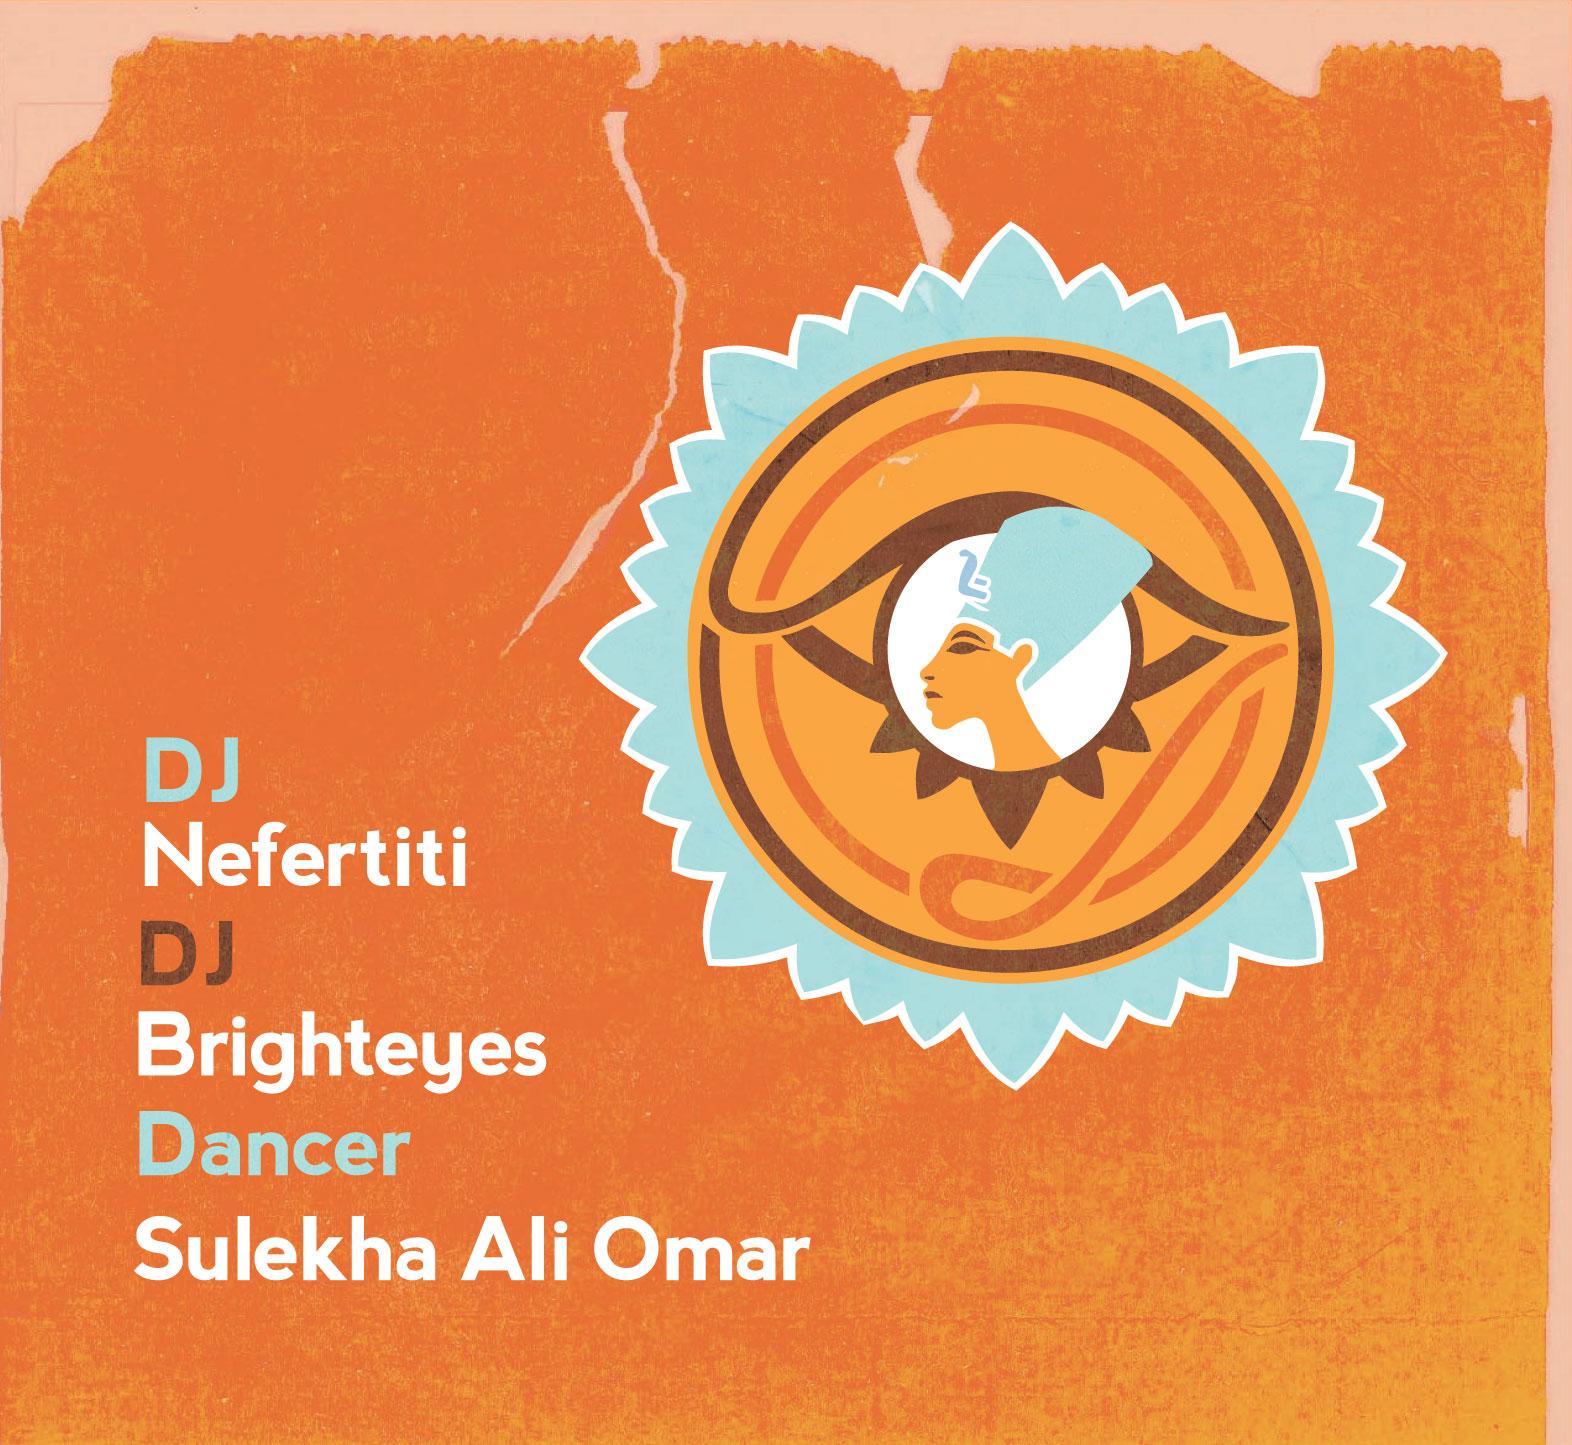 brighteyes_nefirtiti_logo_global